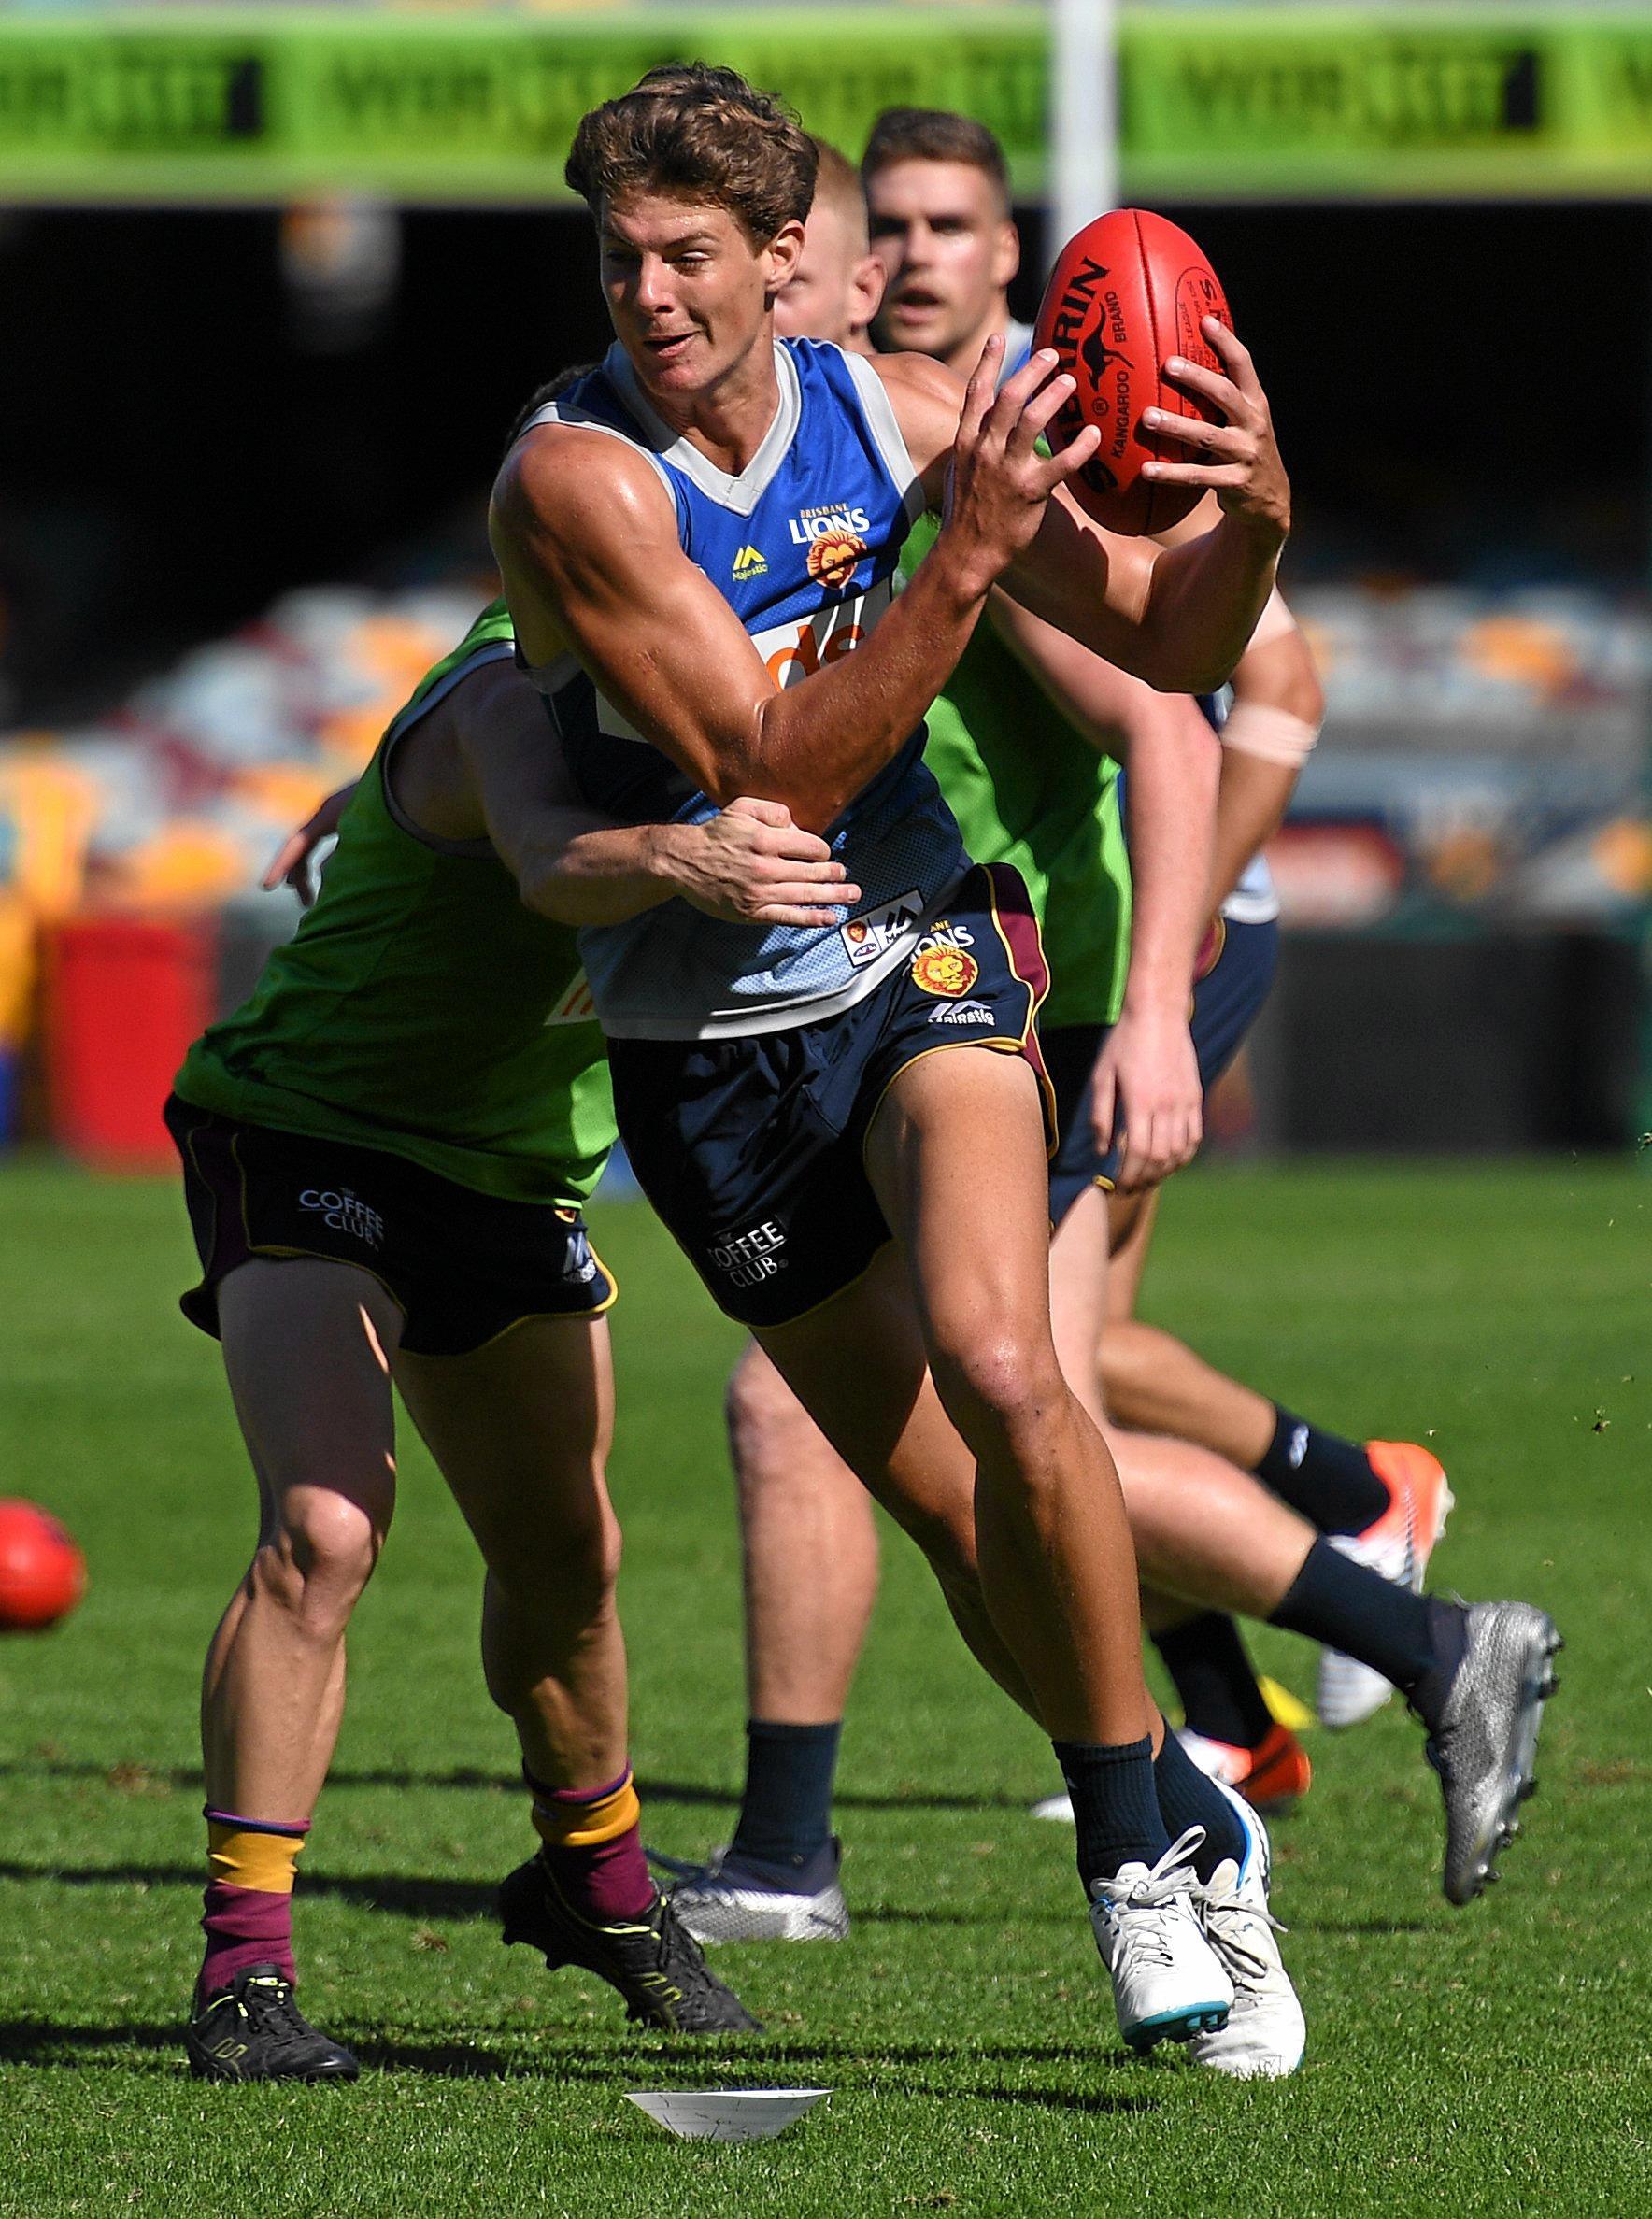 TRAINING HARD: Brisbane Lions'  Tom Fullarton during training in Brisbane.